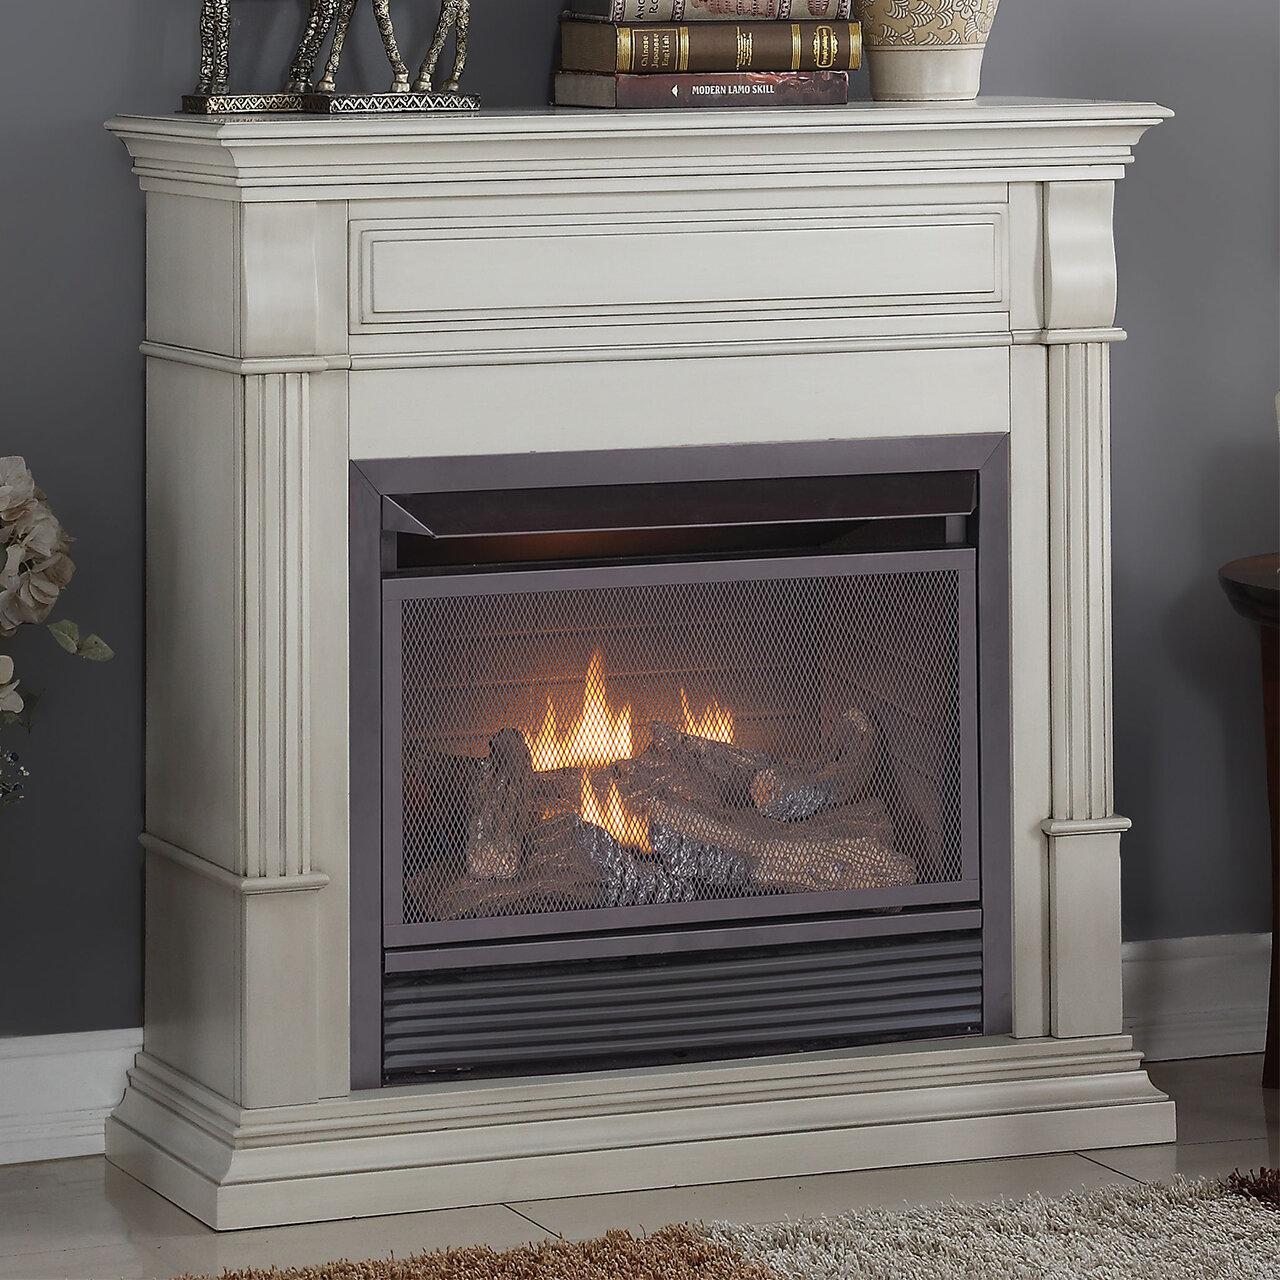 duluth forge vent free natural gas propane fireplace reviews wayfair rh wayfair com vent free lp gas fireplace insert